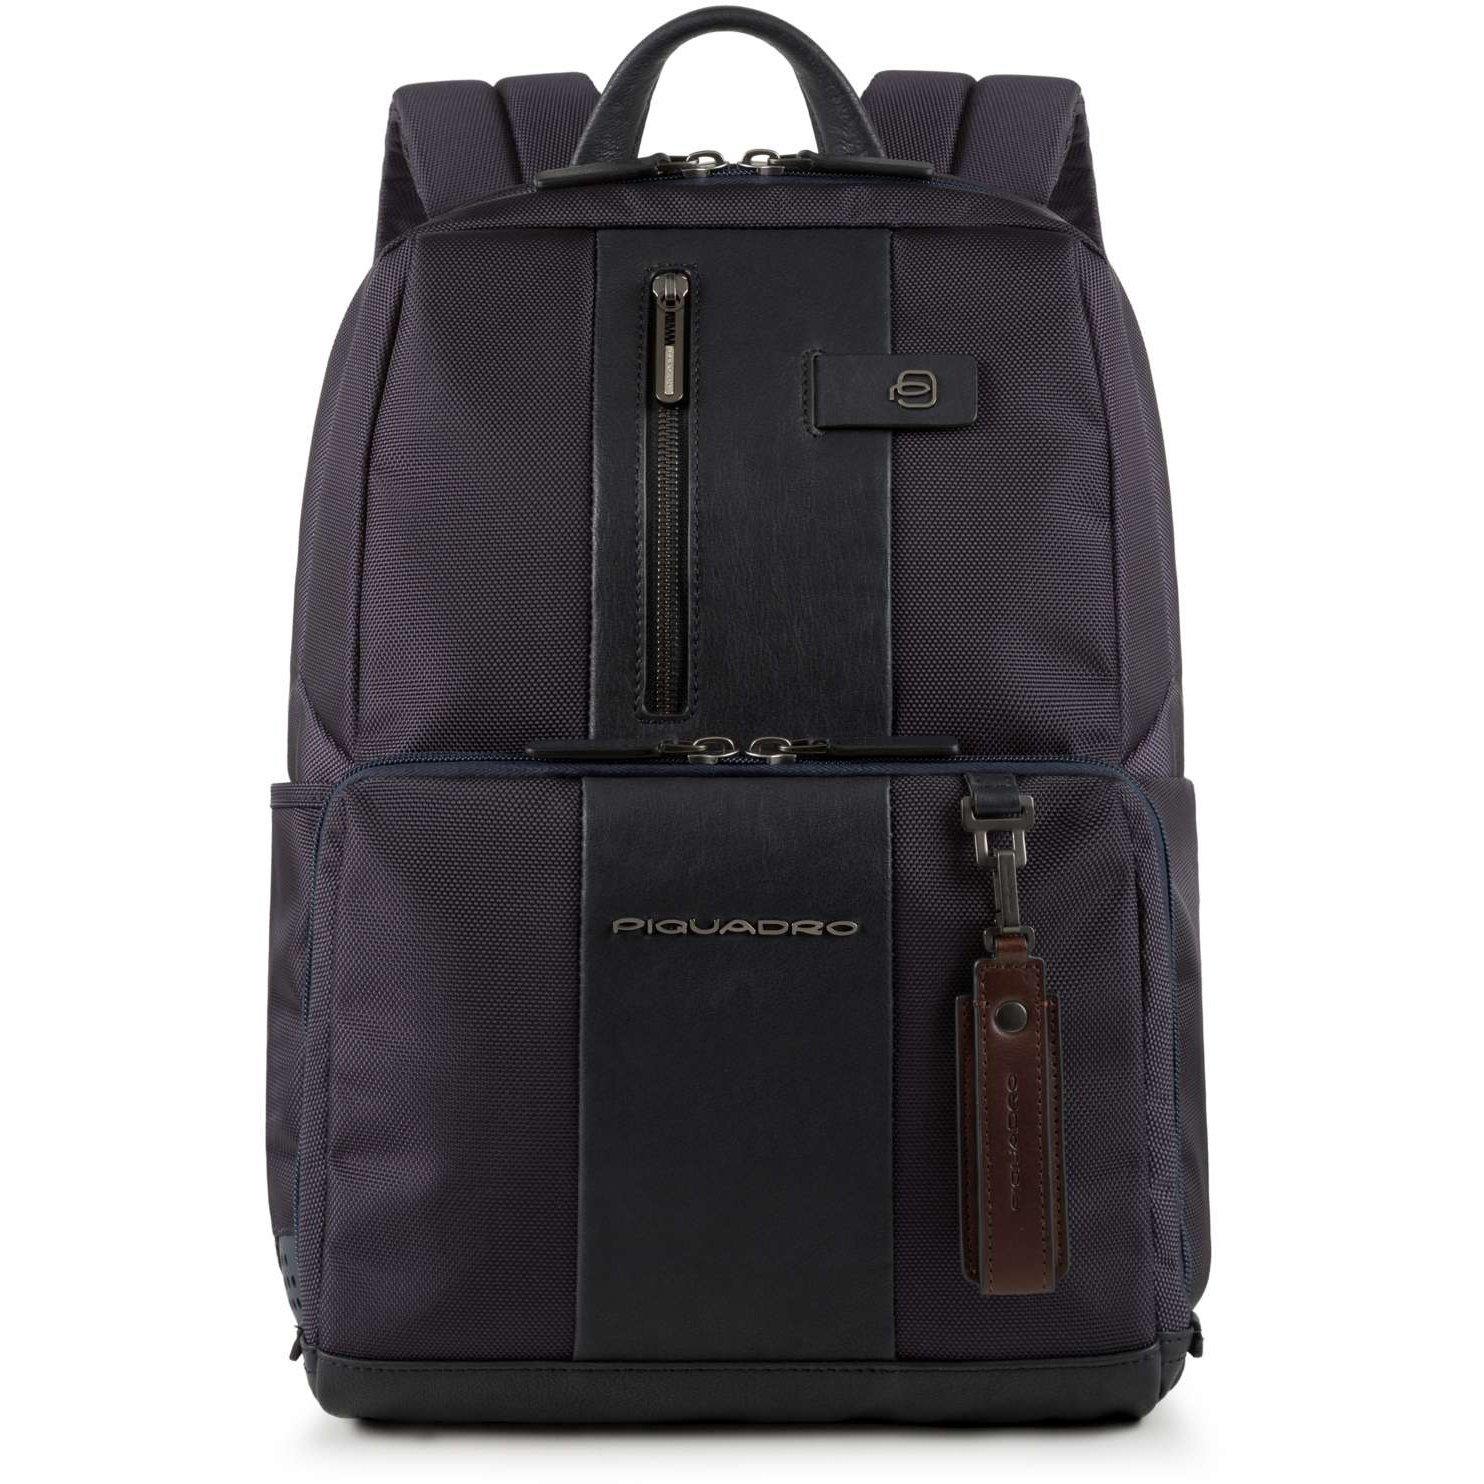 fab751ccda4b Amazon.com: PIQUADRO Backpack Male Blue - CA3214BR-BLU: Shoes